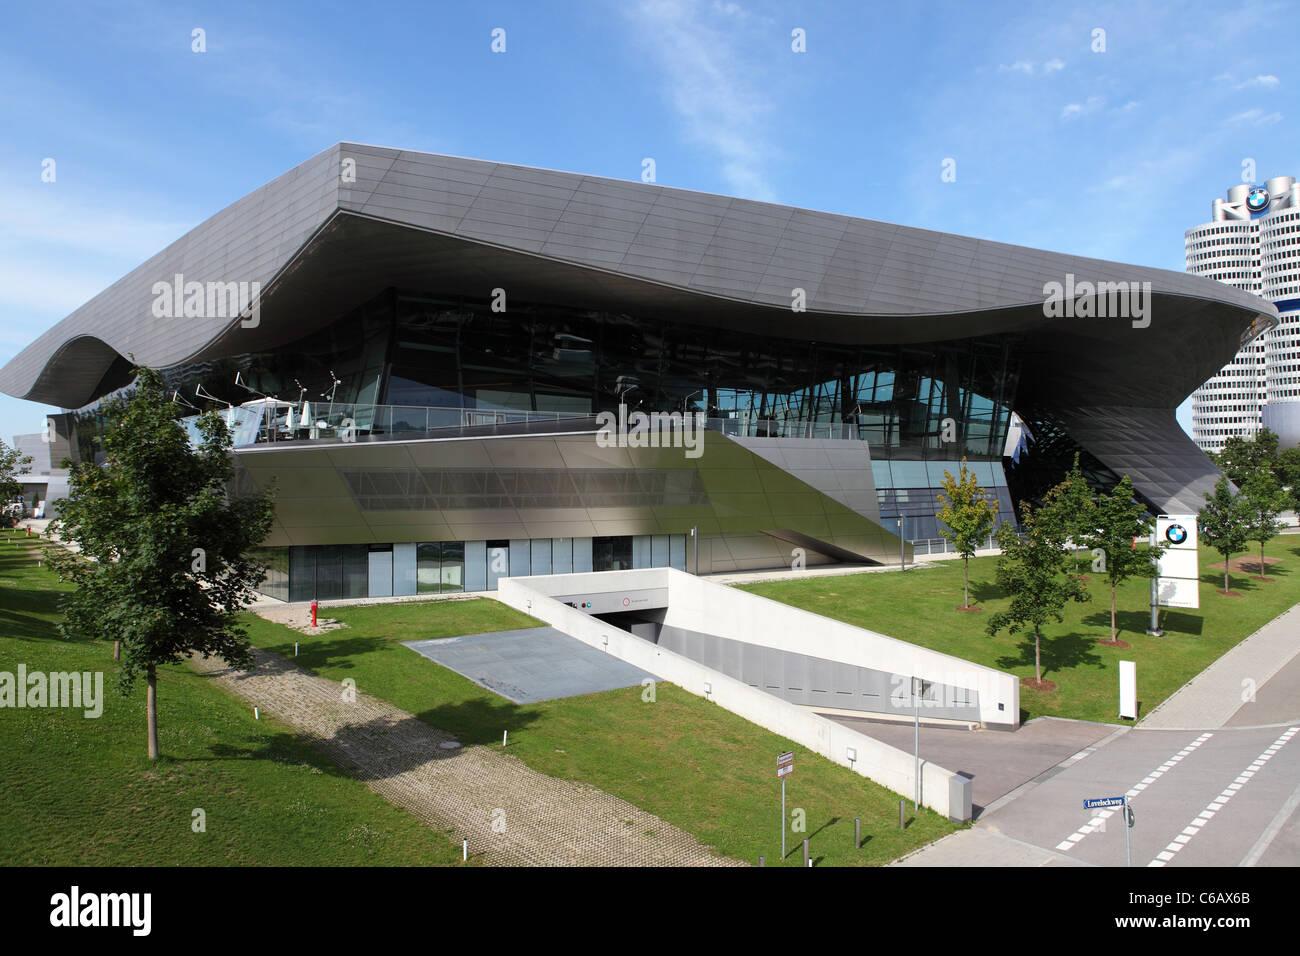 The BMW Welt (BMW World) building, in Munich, Bavaria, Germany. - Stock Image